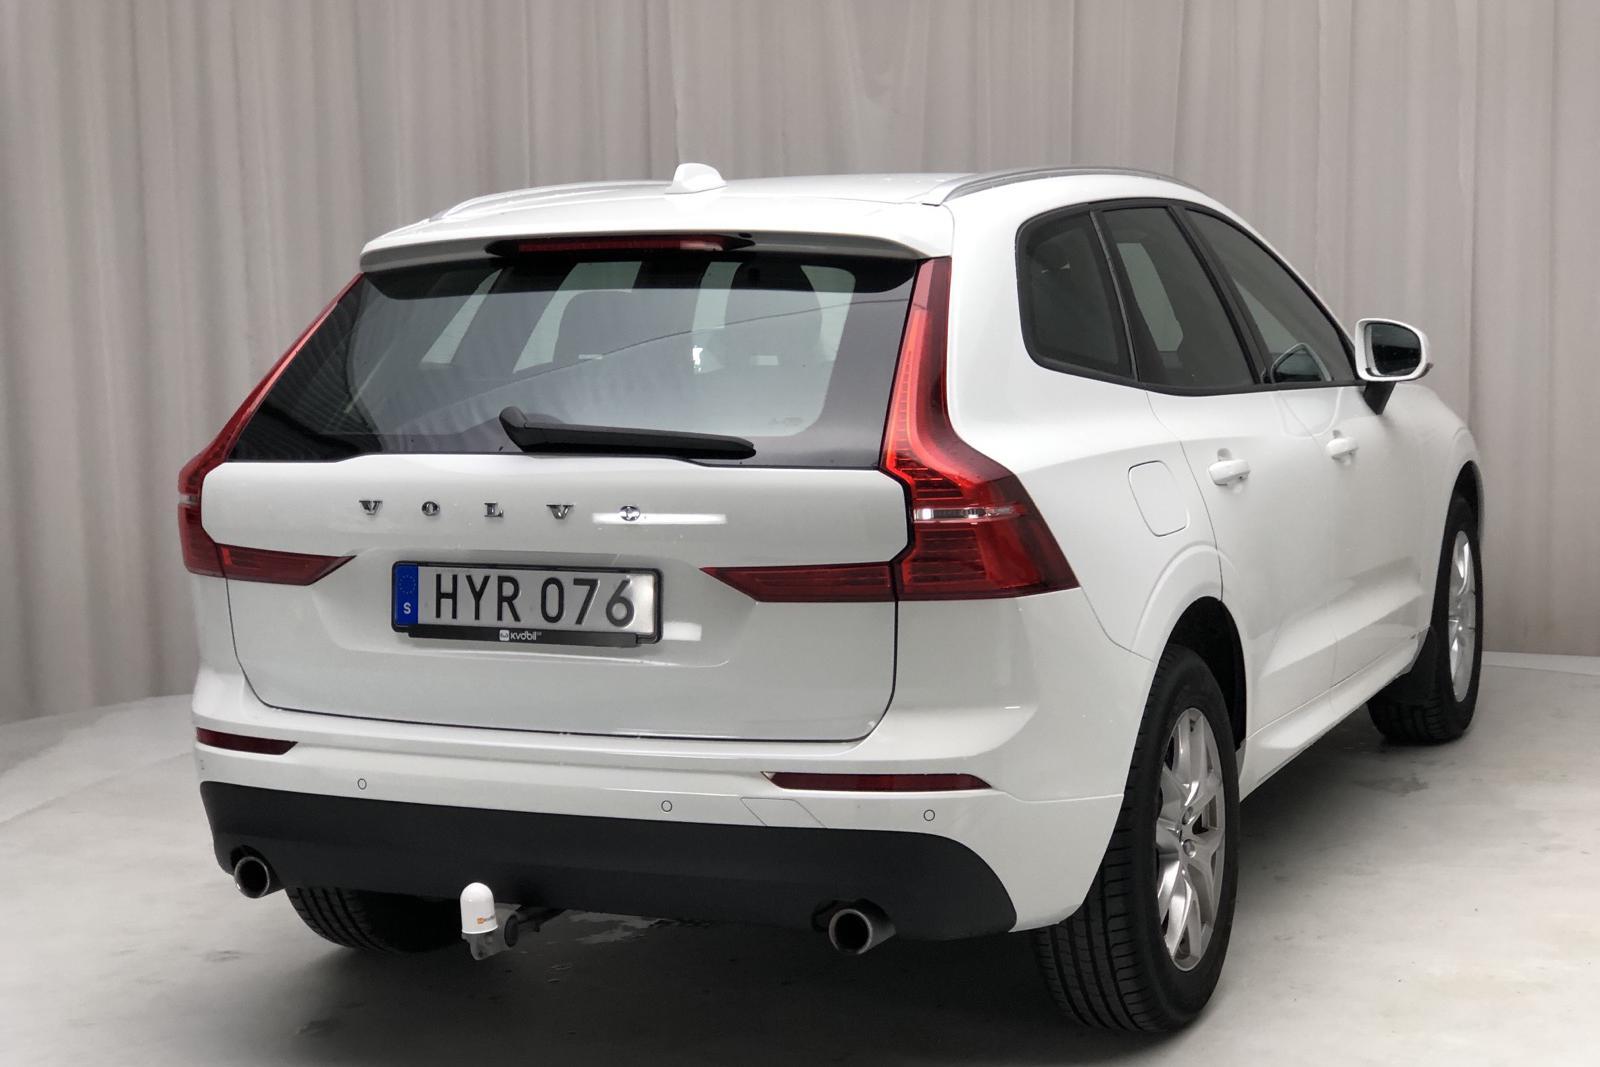 Volvo XC60 D4 AWD (190hk) - 46 000 km - Automatic - white - 2018